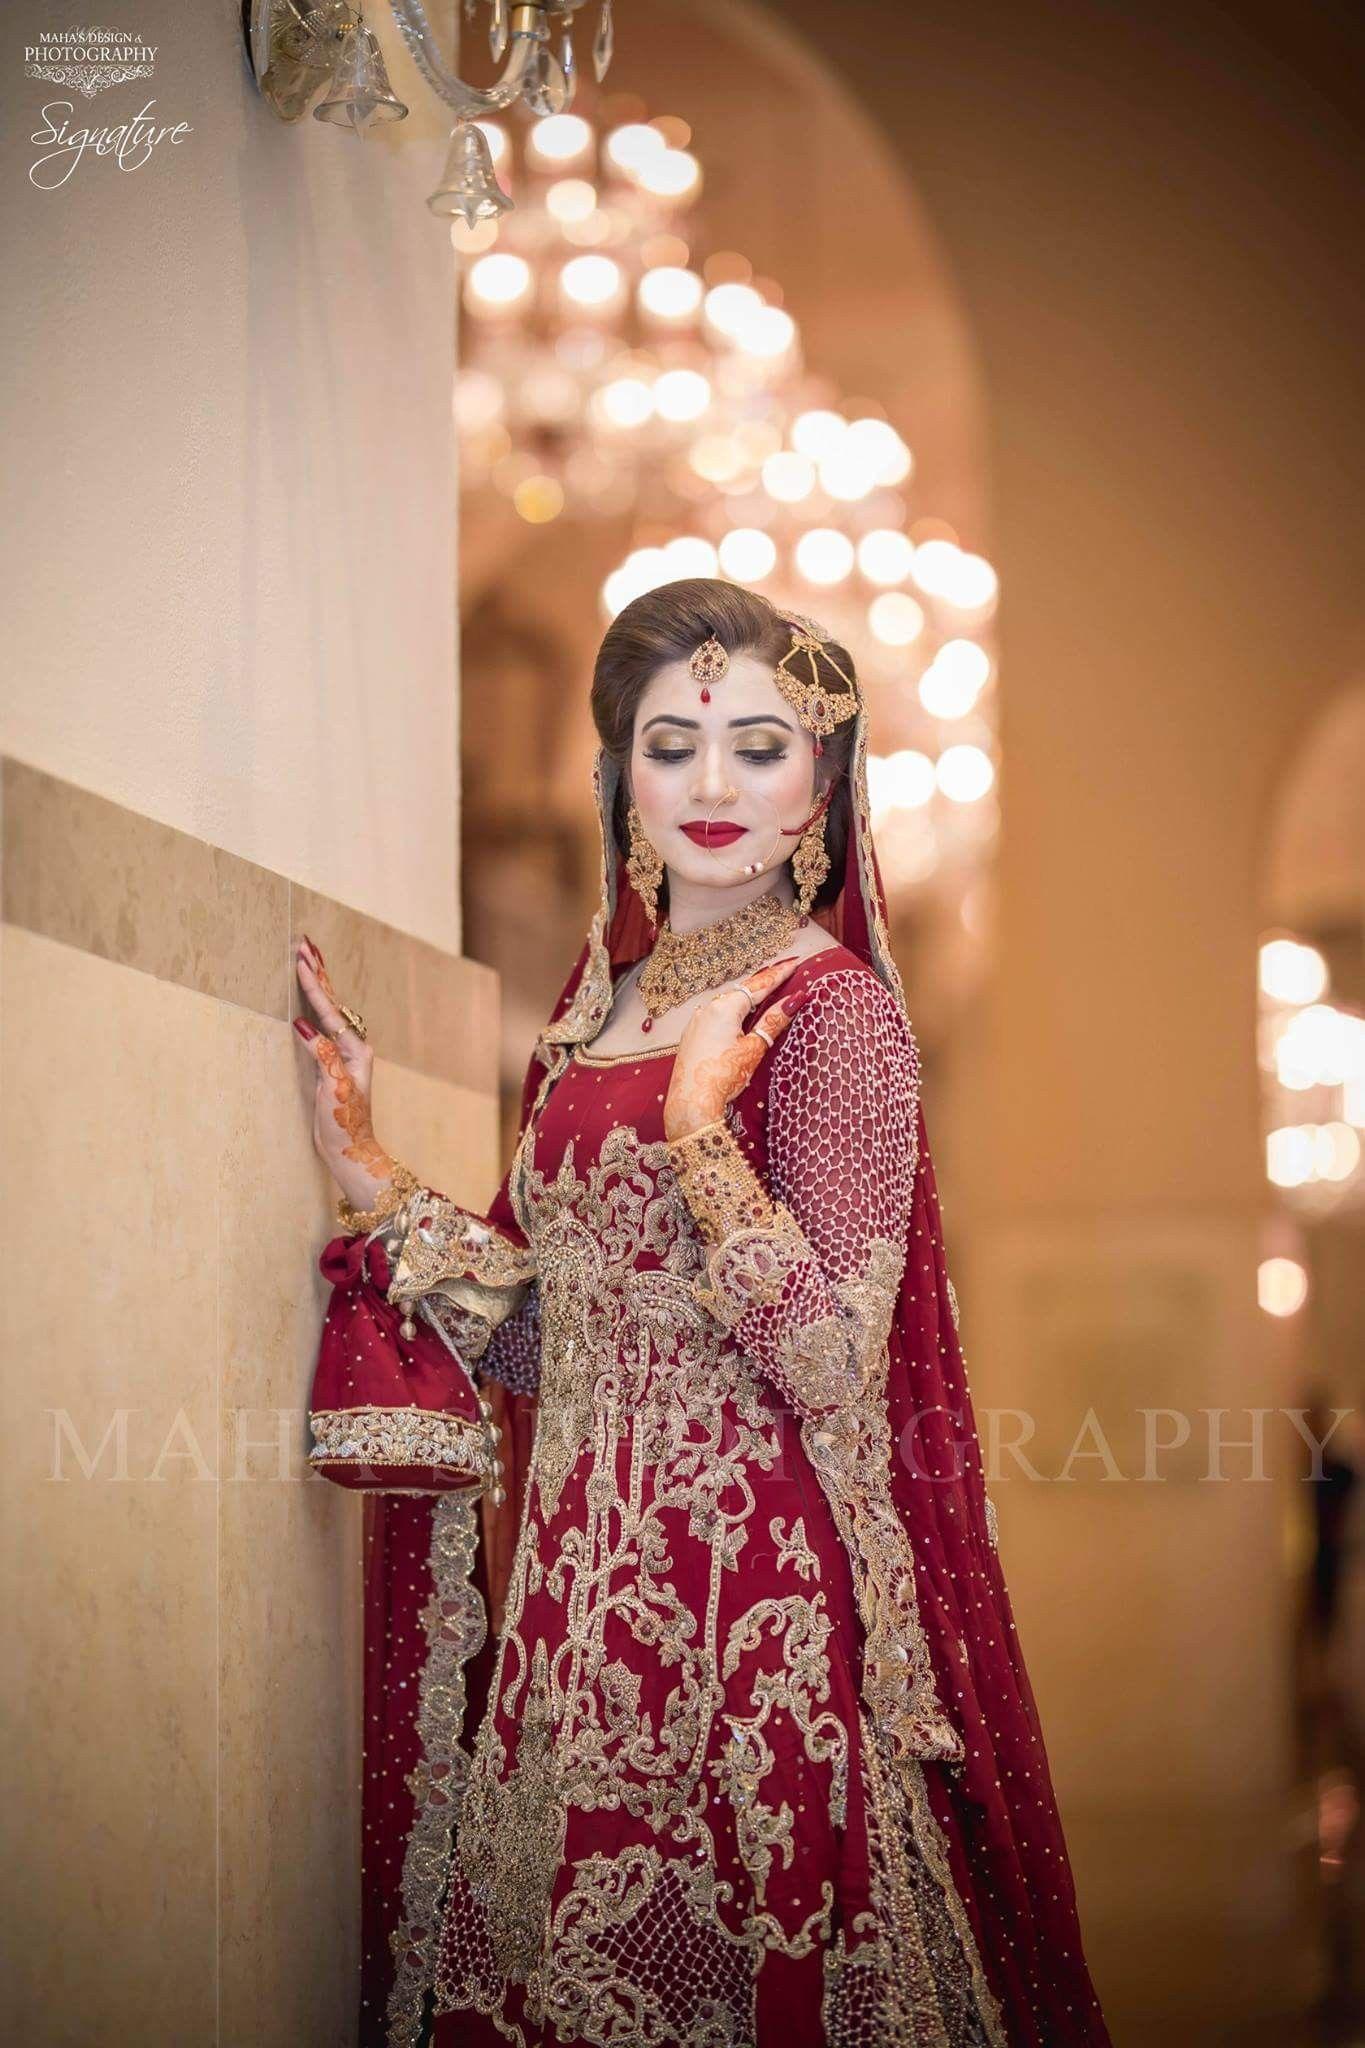 Pin von Imran Khan auf pakistani bridal   Pinterest